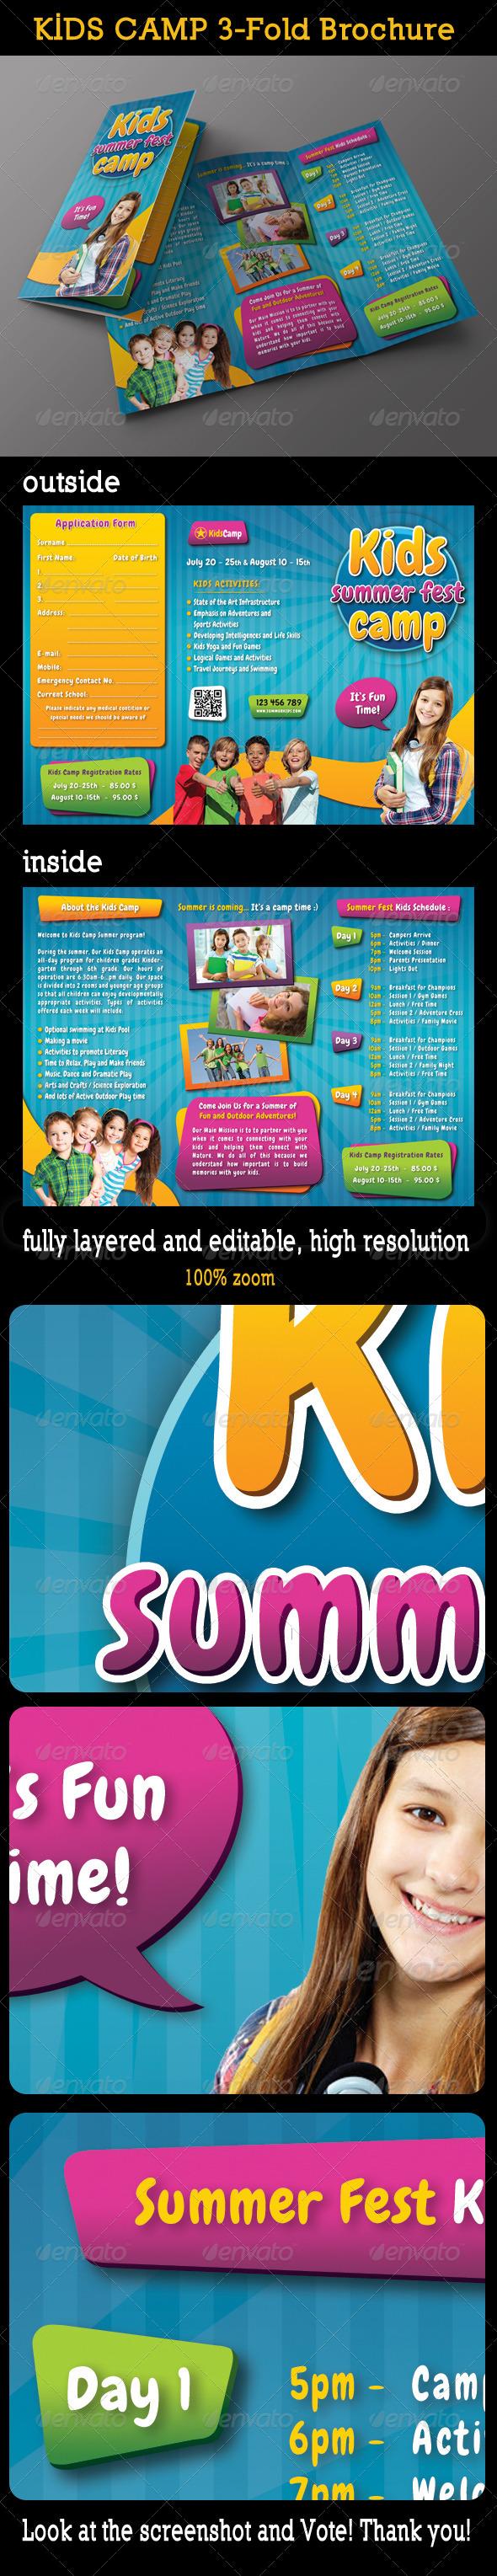 Kids Summer Camp 3-Fold Brochure 01